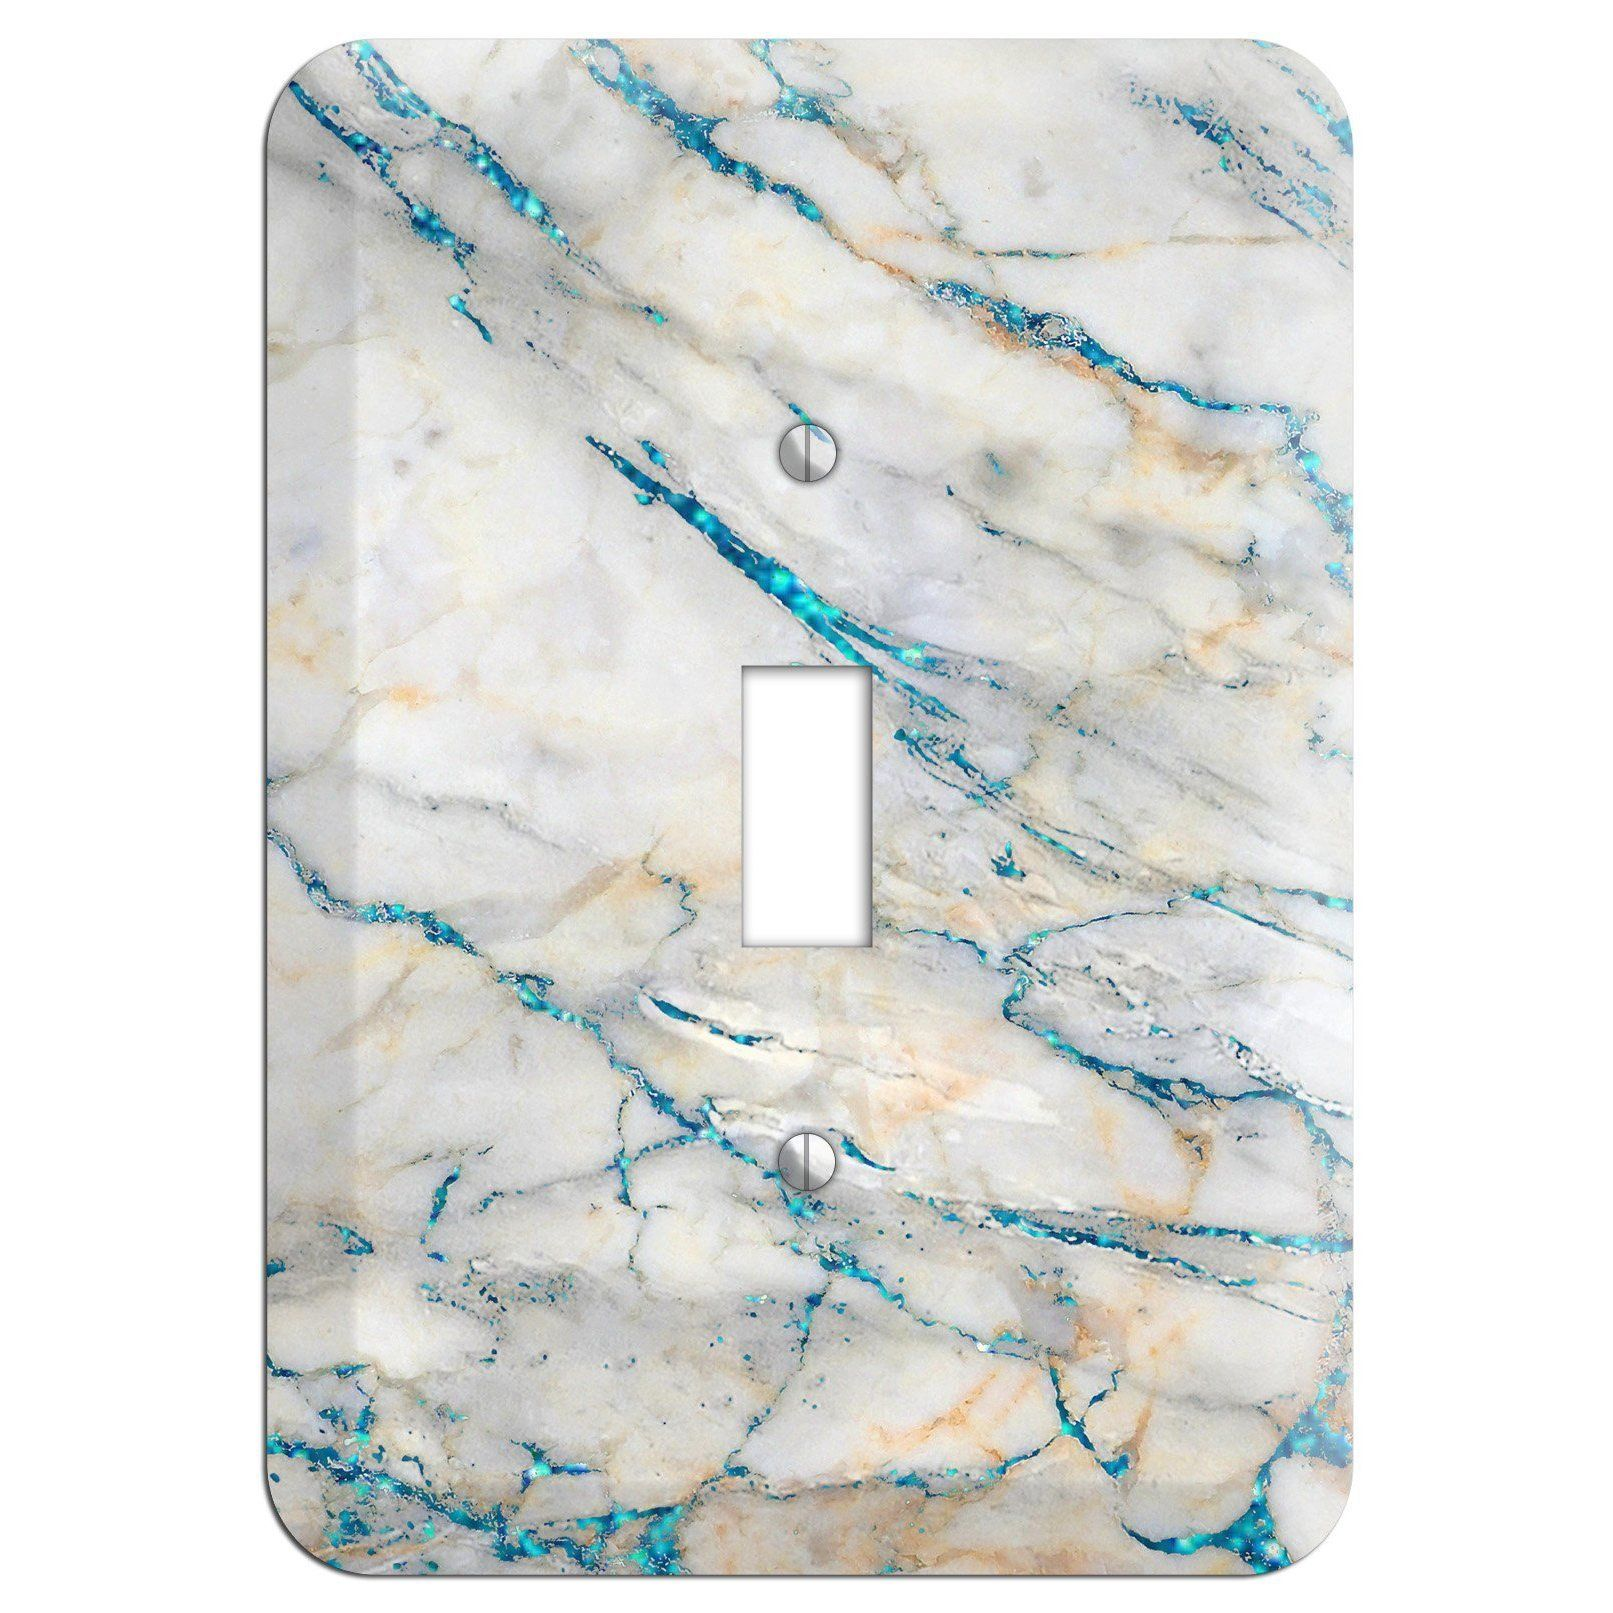 Bondi Blue Marble Cover Plates Light Switch Plate Cover Plate Covers Switch Plate Covers